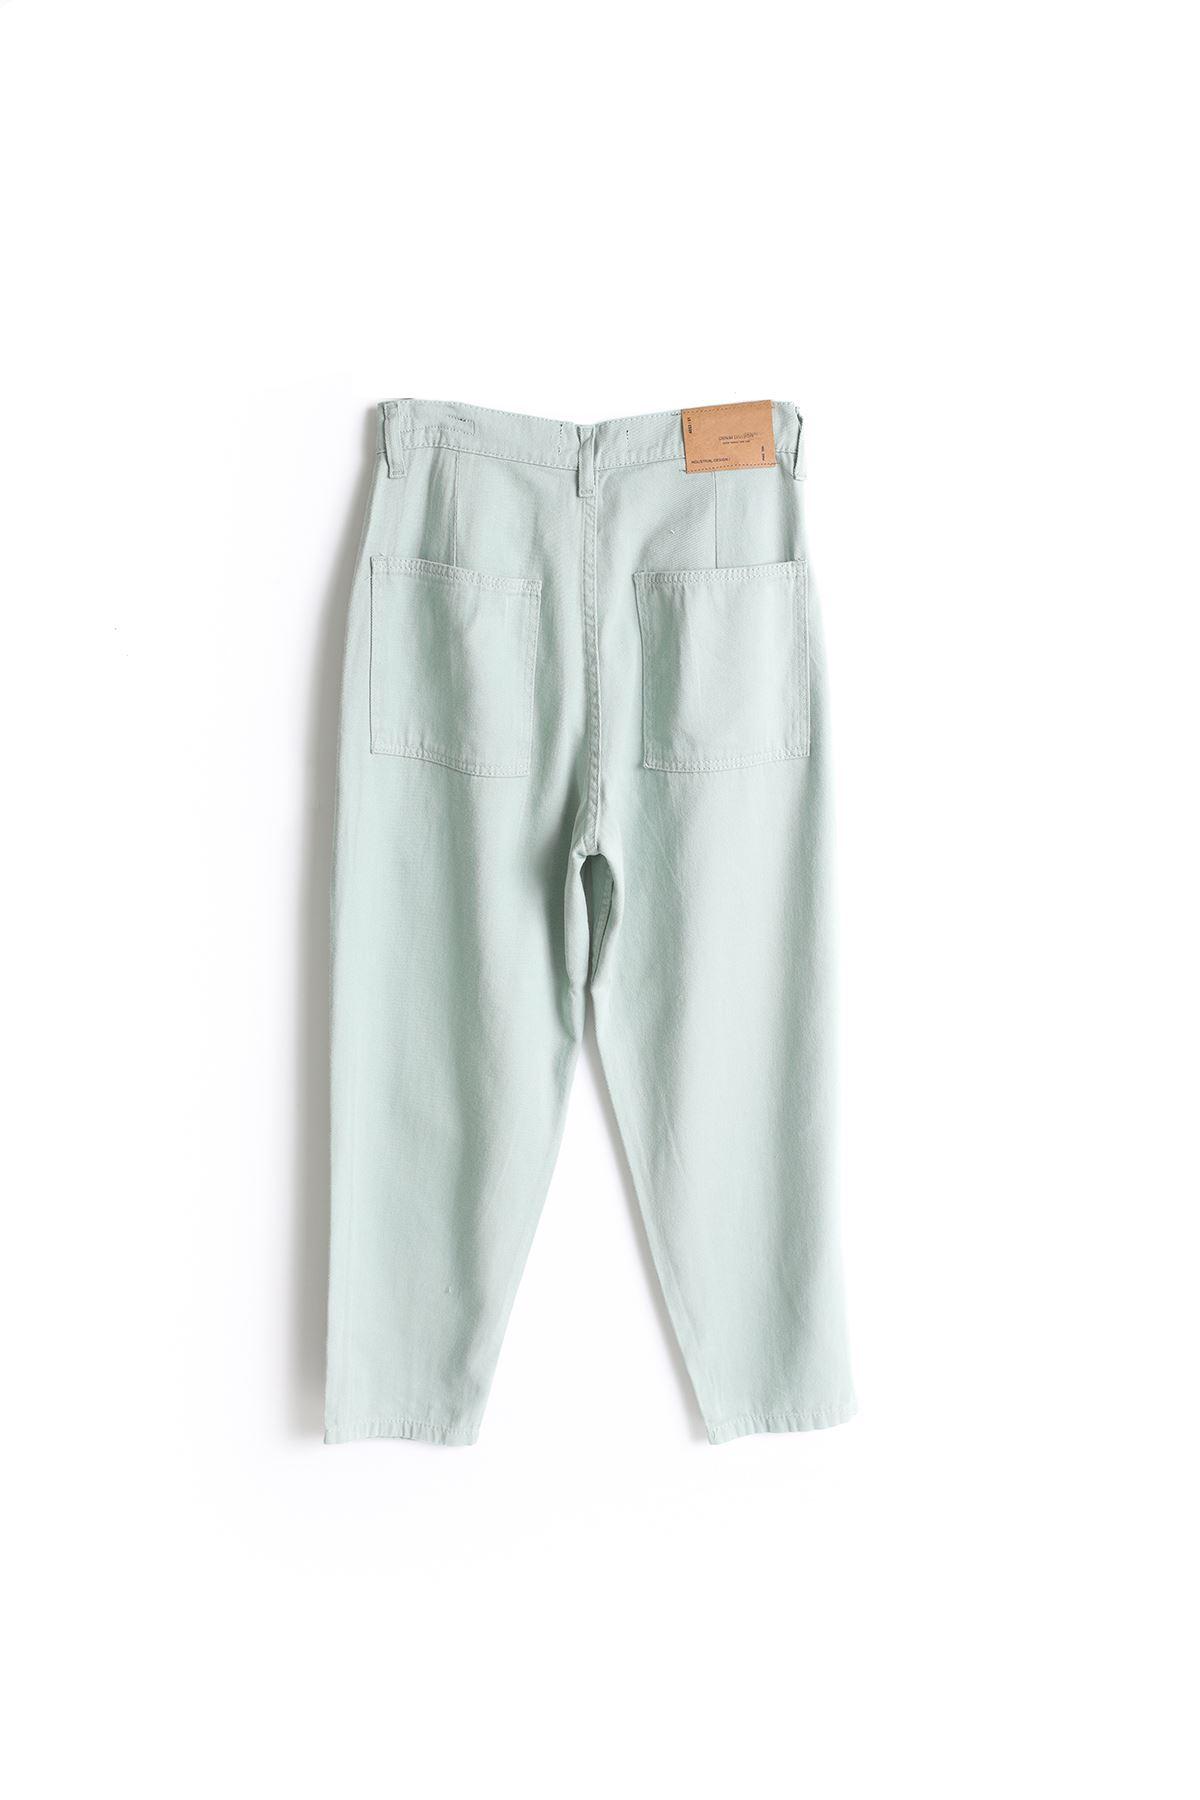 Deniz Yeşili Boyfriend Kot Pantolon